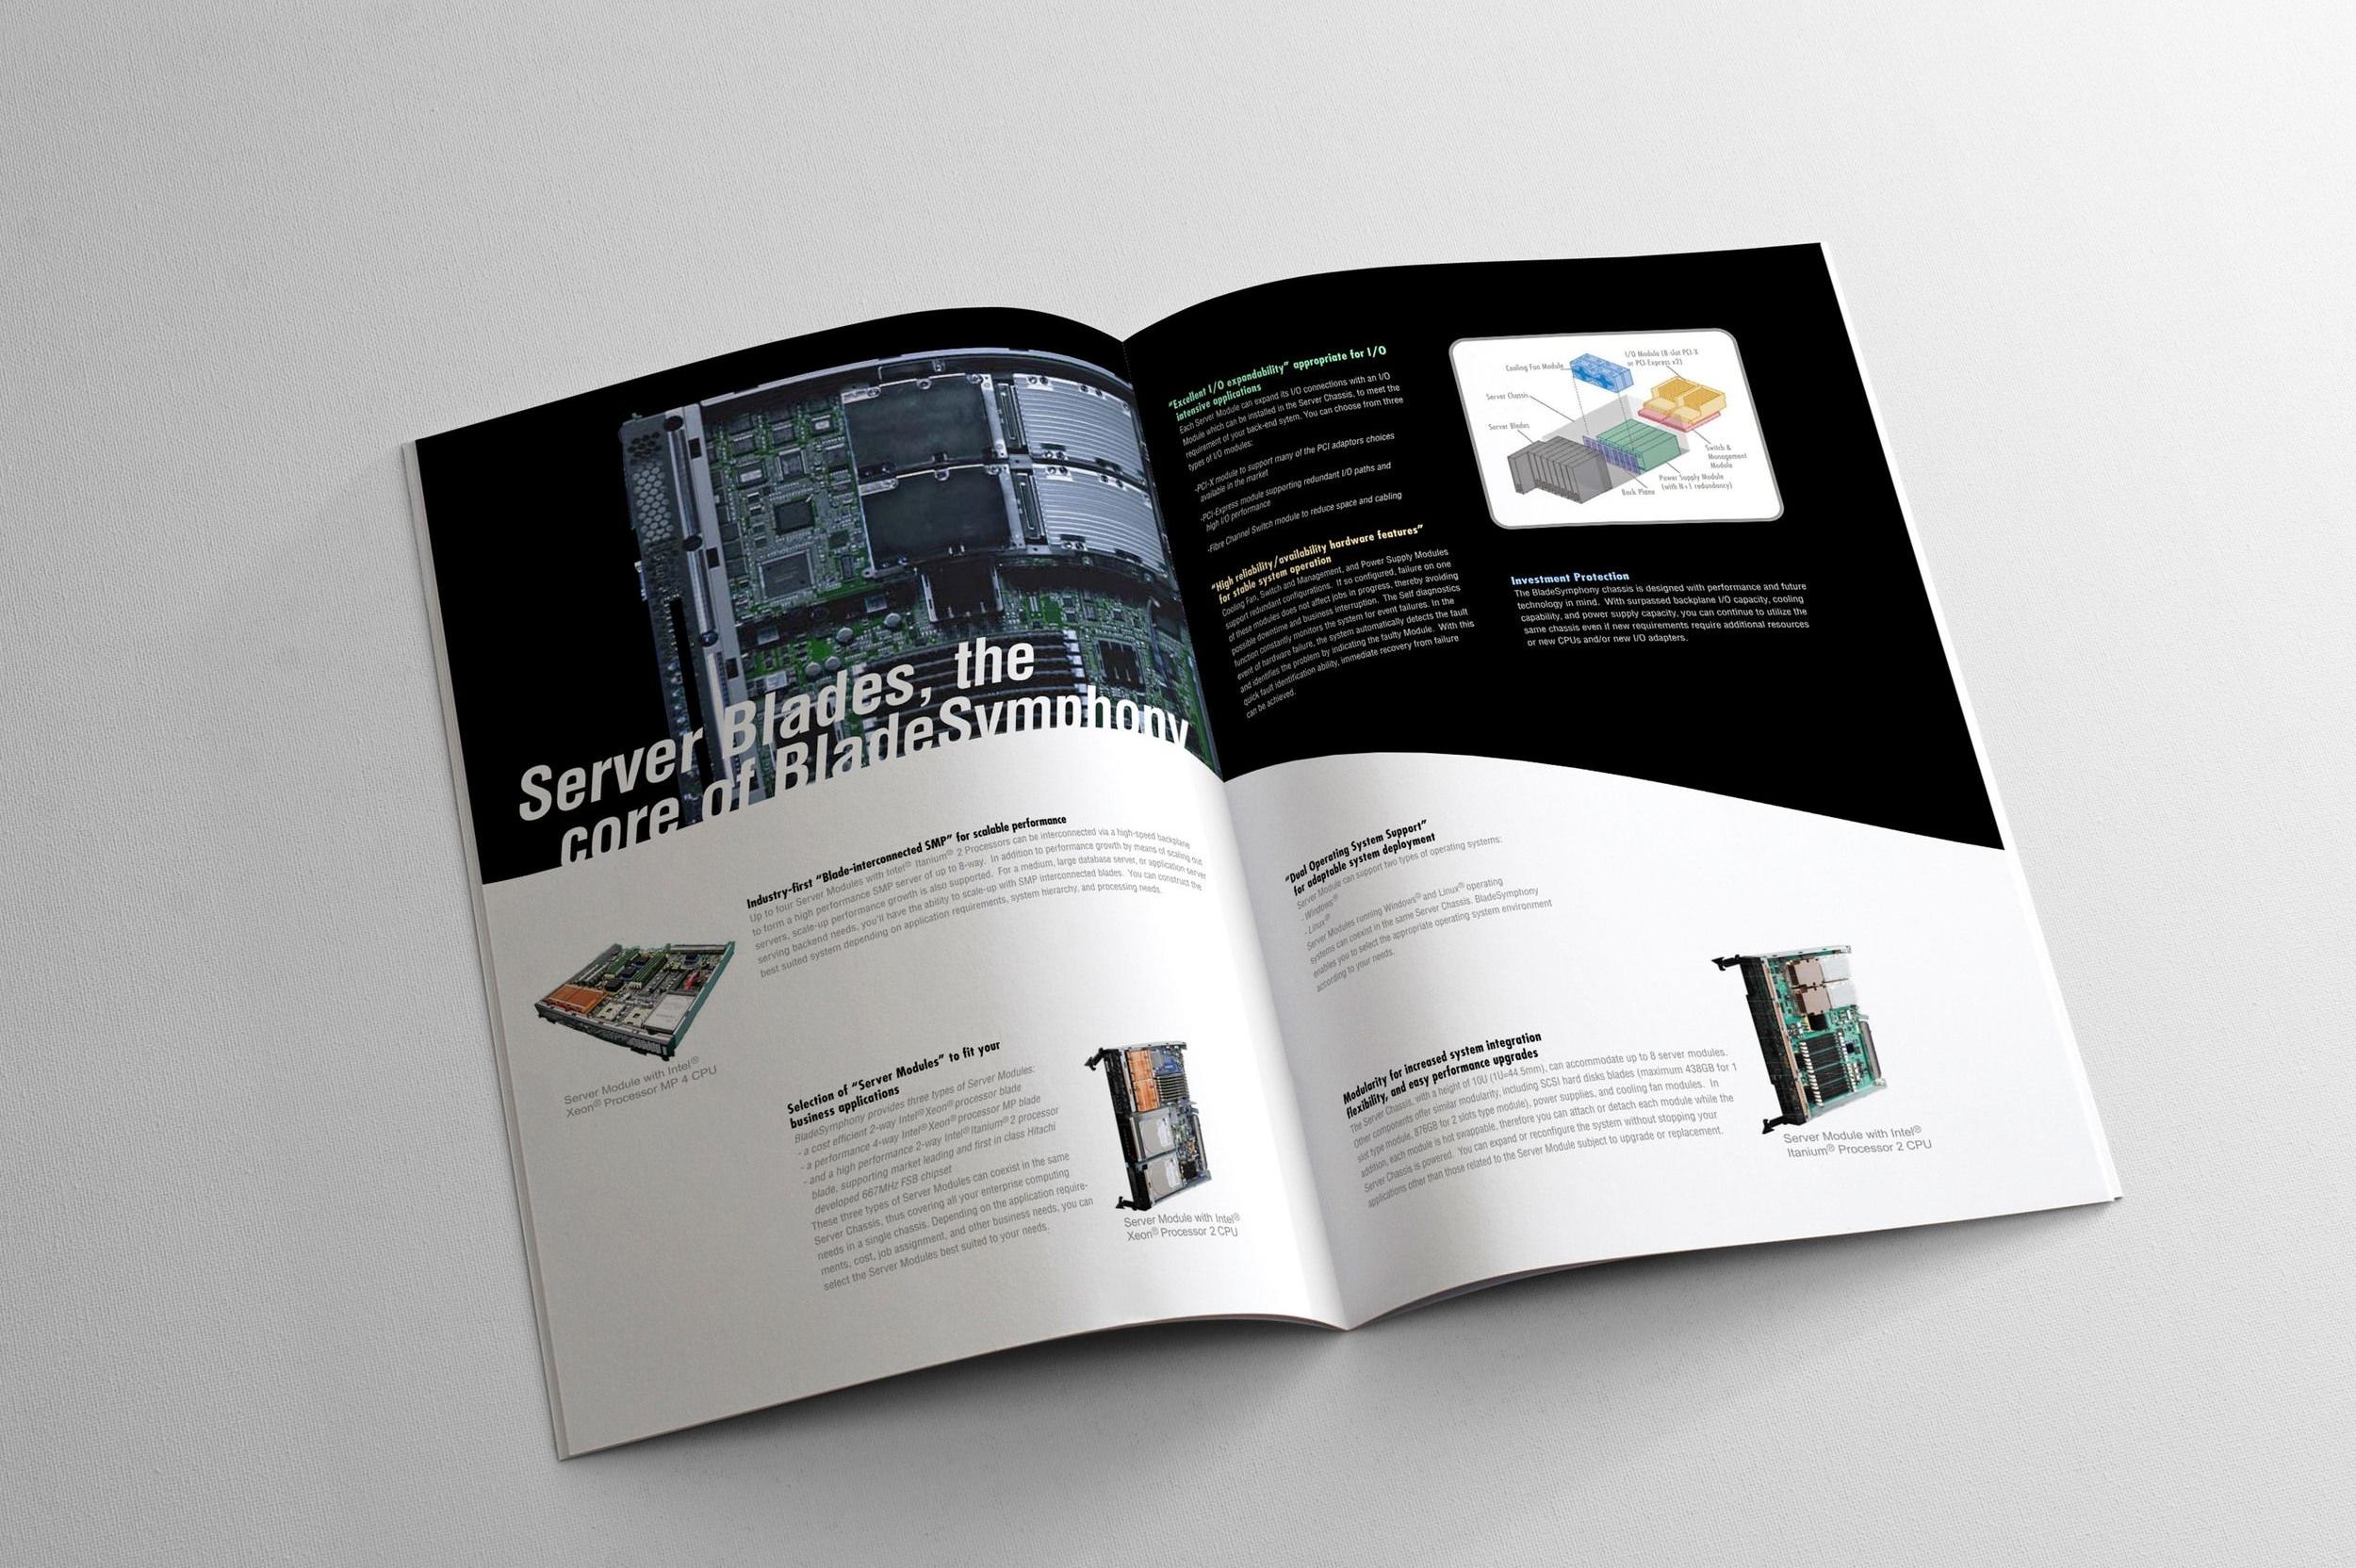 Hitachi-04-compressor.jpeg